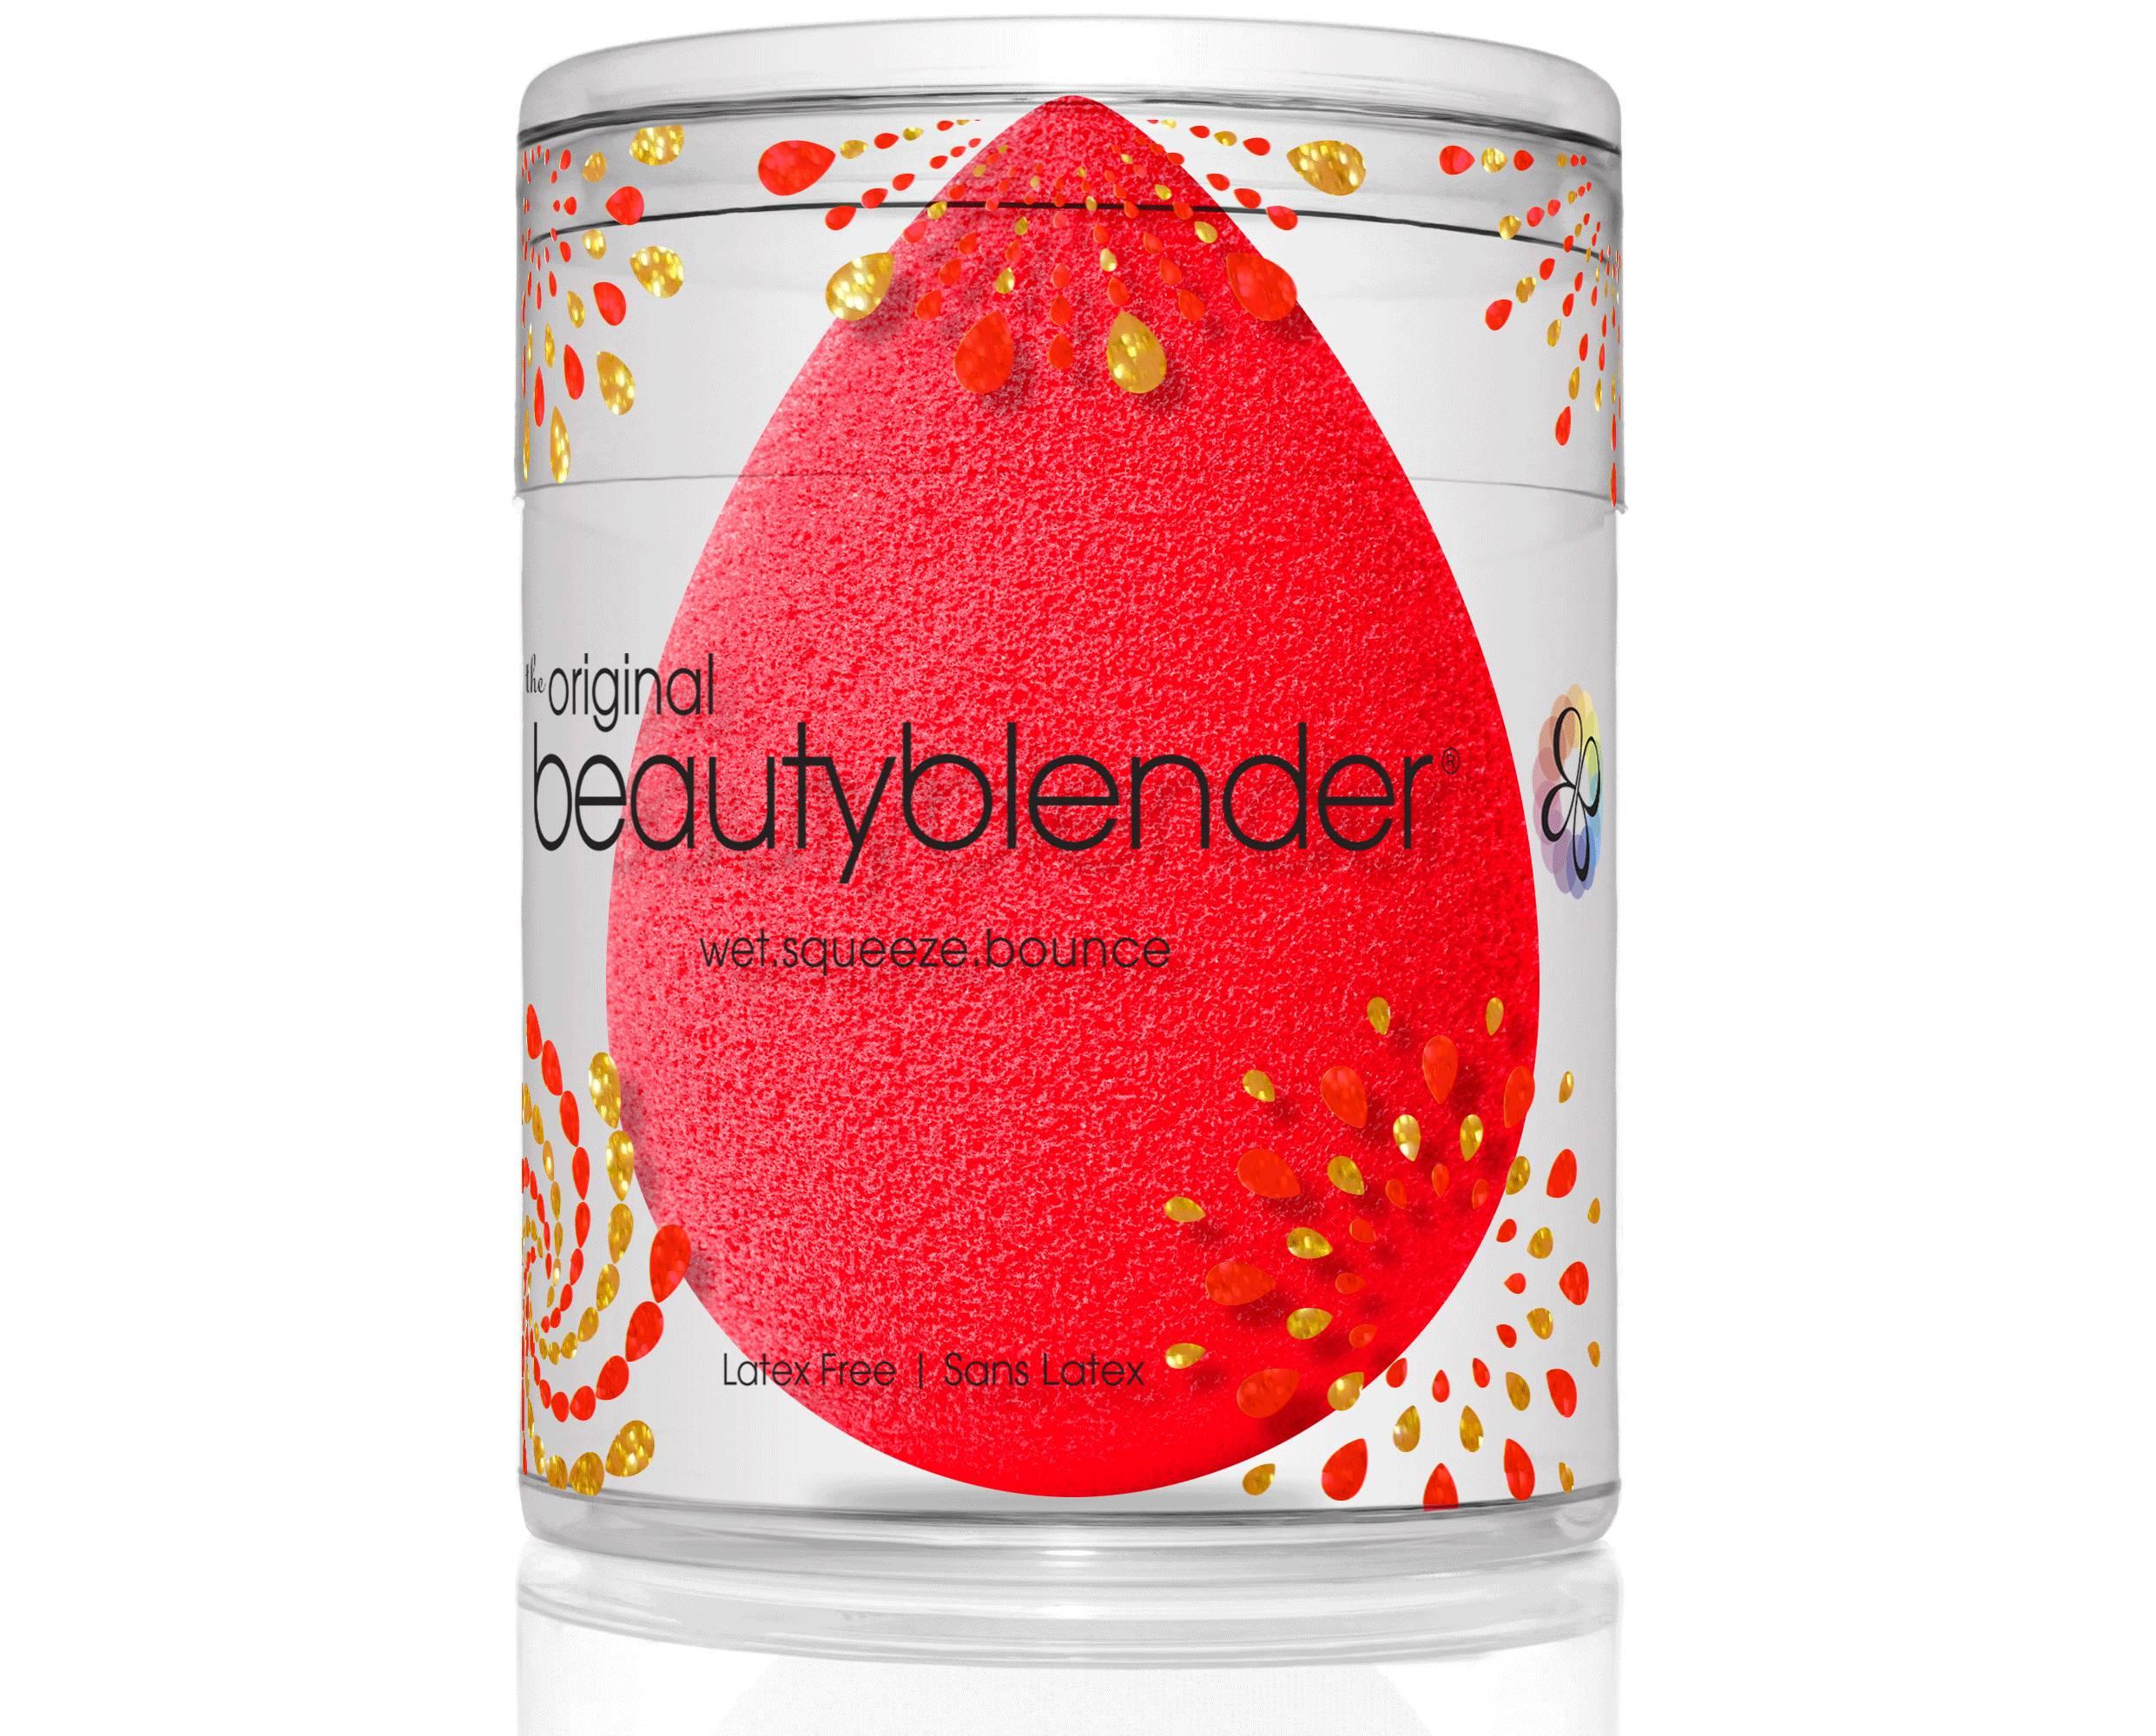 Sephora 丝芙兰美妆蛋庆典红化妆海绵-正是热闹喜庆时,美妆也要有图片